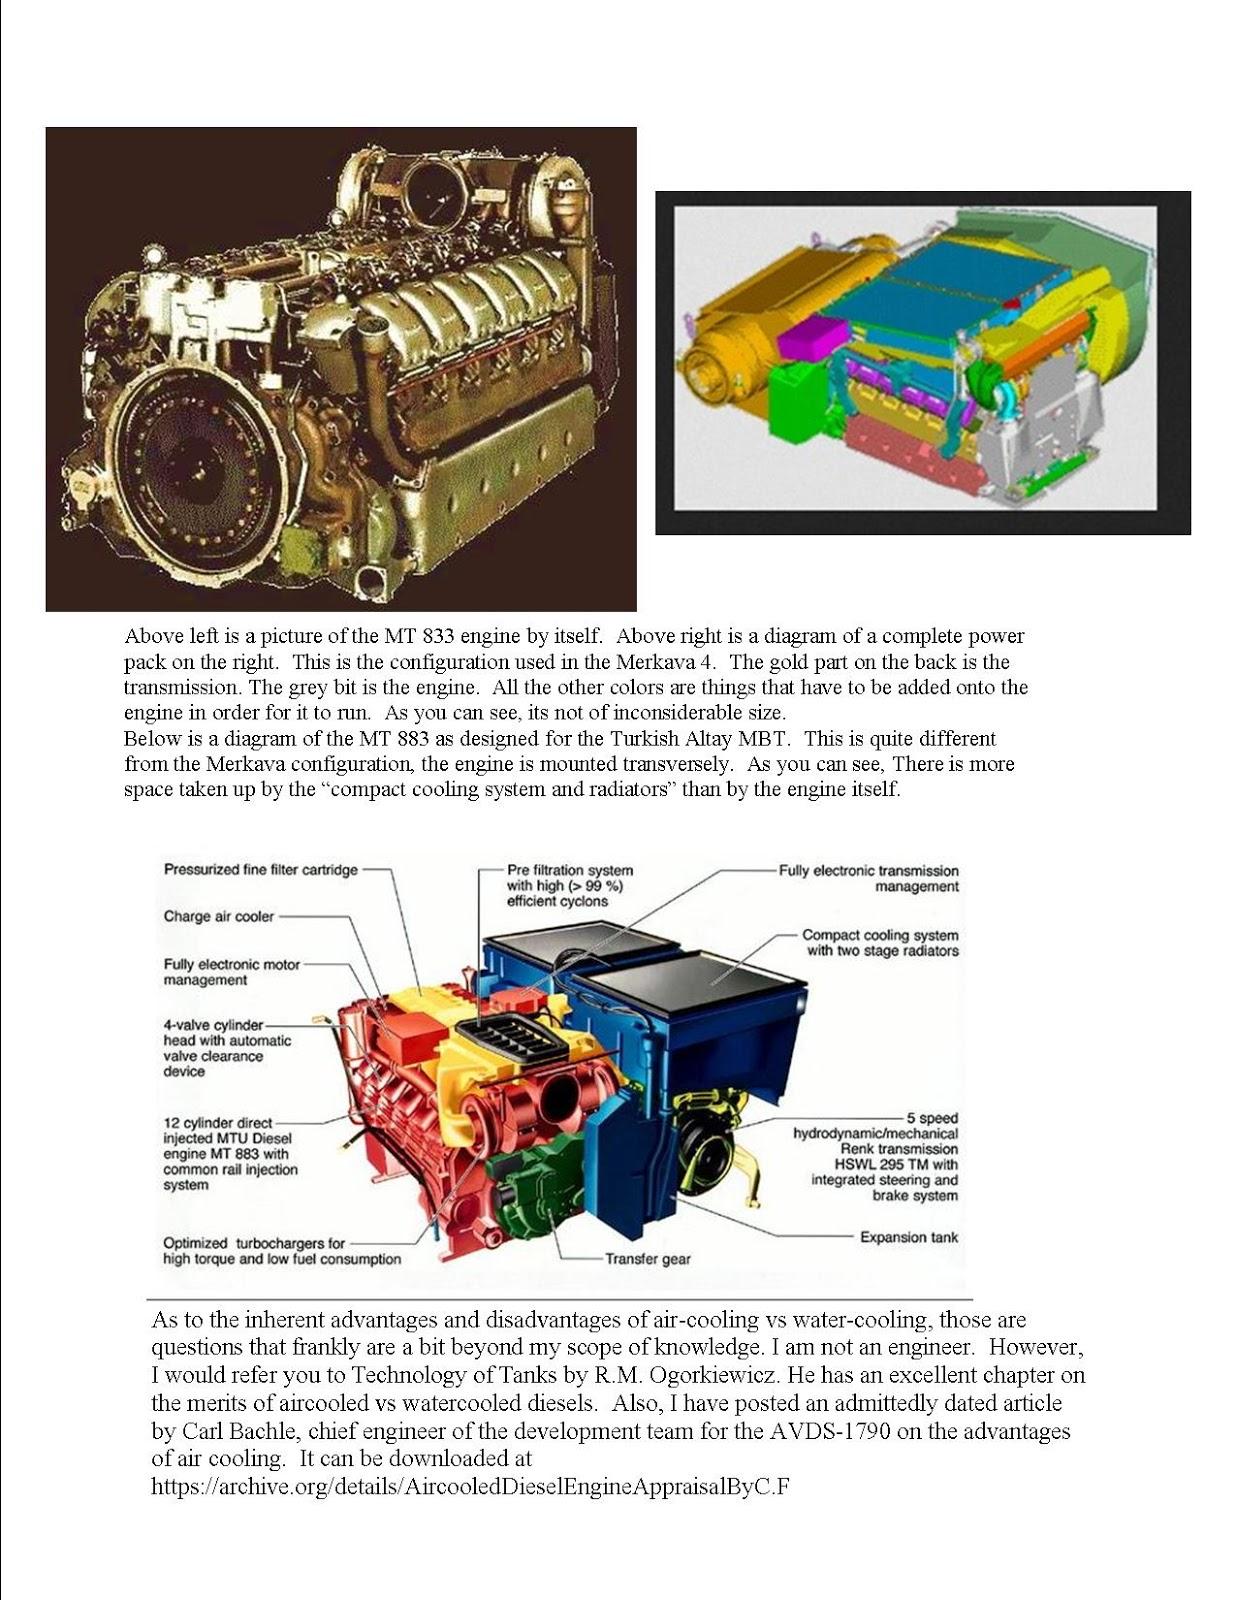 LV-100-5 Turbine Engine - Armored Vehicle History - World of